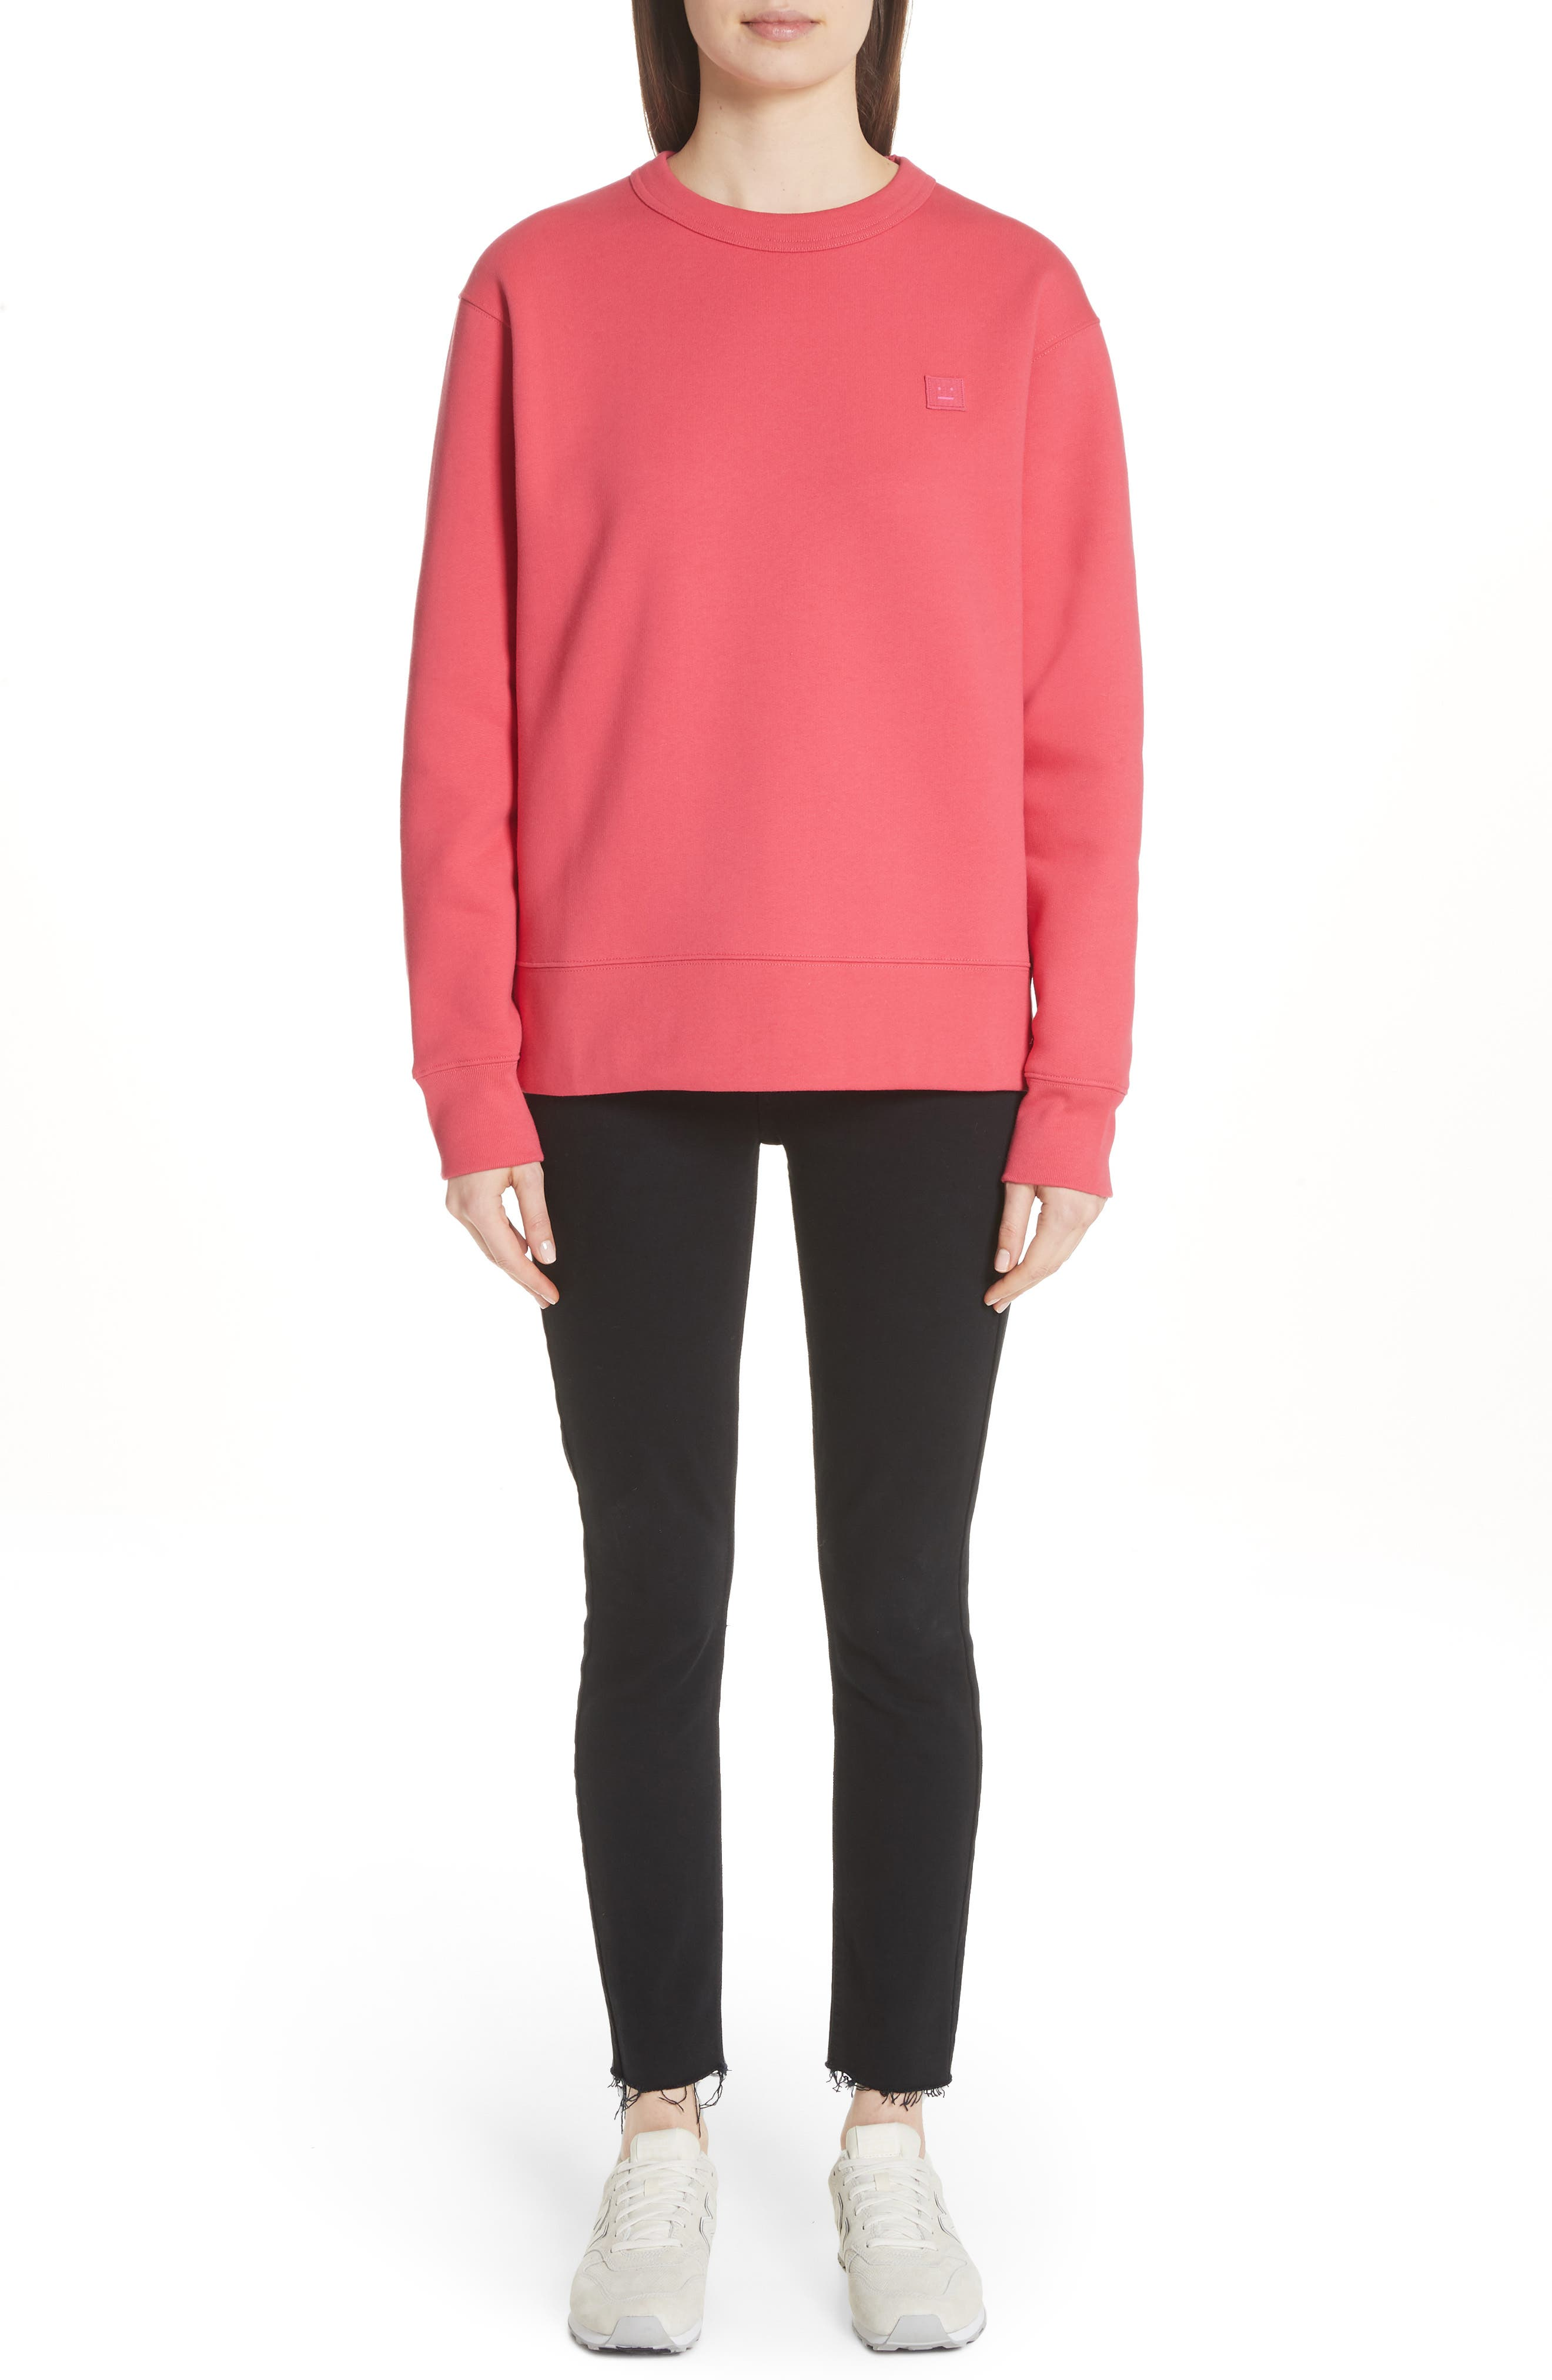 Fairview Crewneck Sweatshirt,                             Alternate thumbnail 8, color,                             Neon Pink